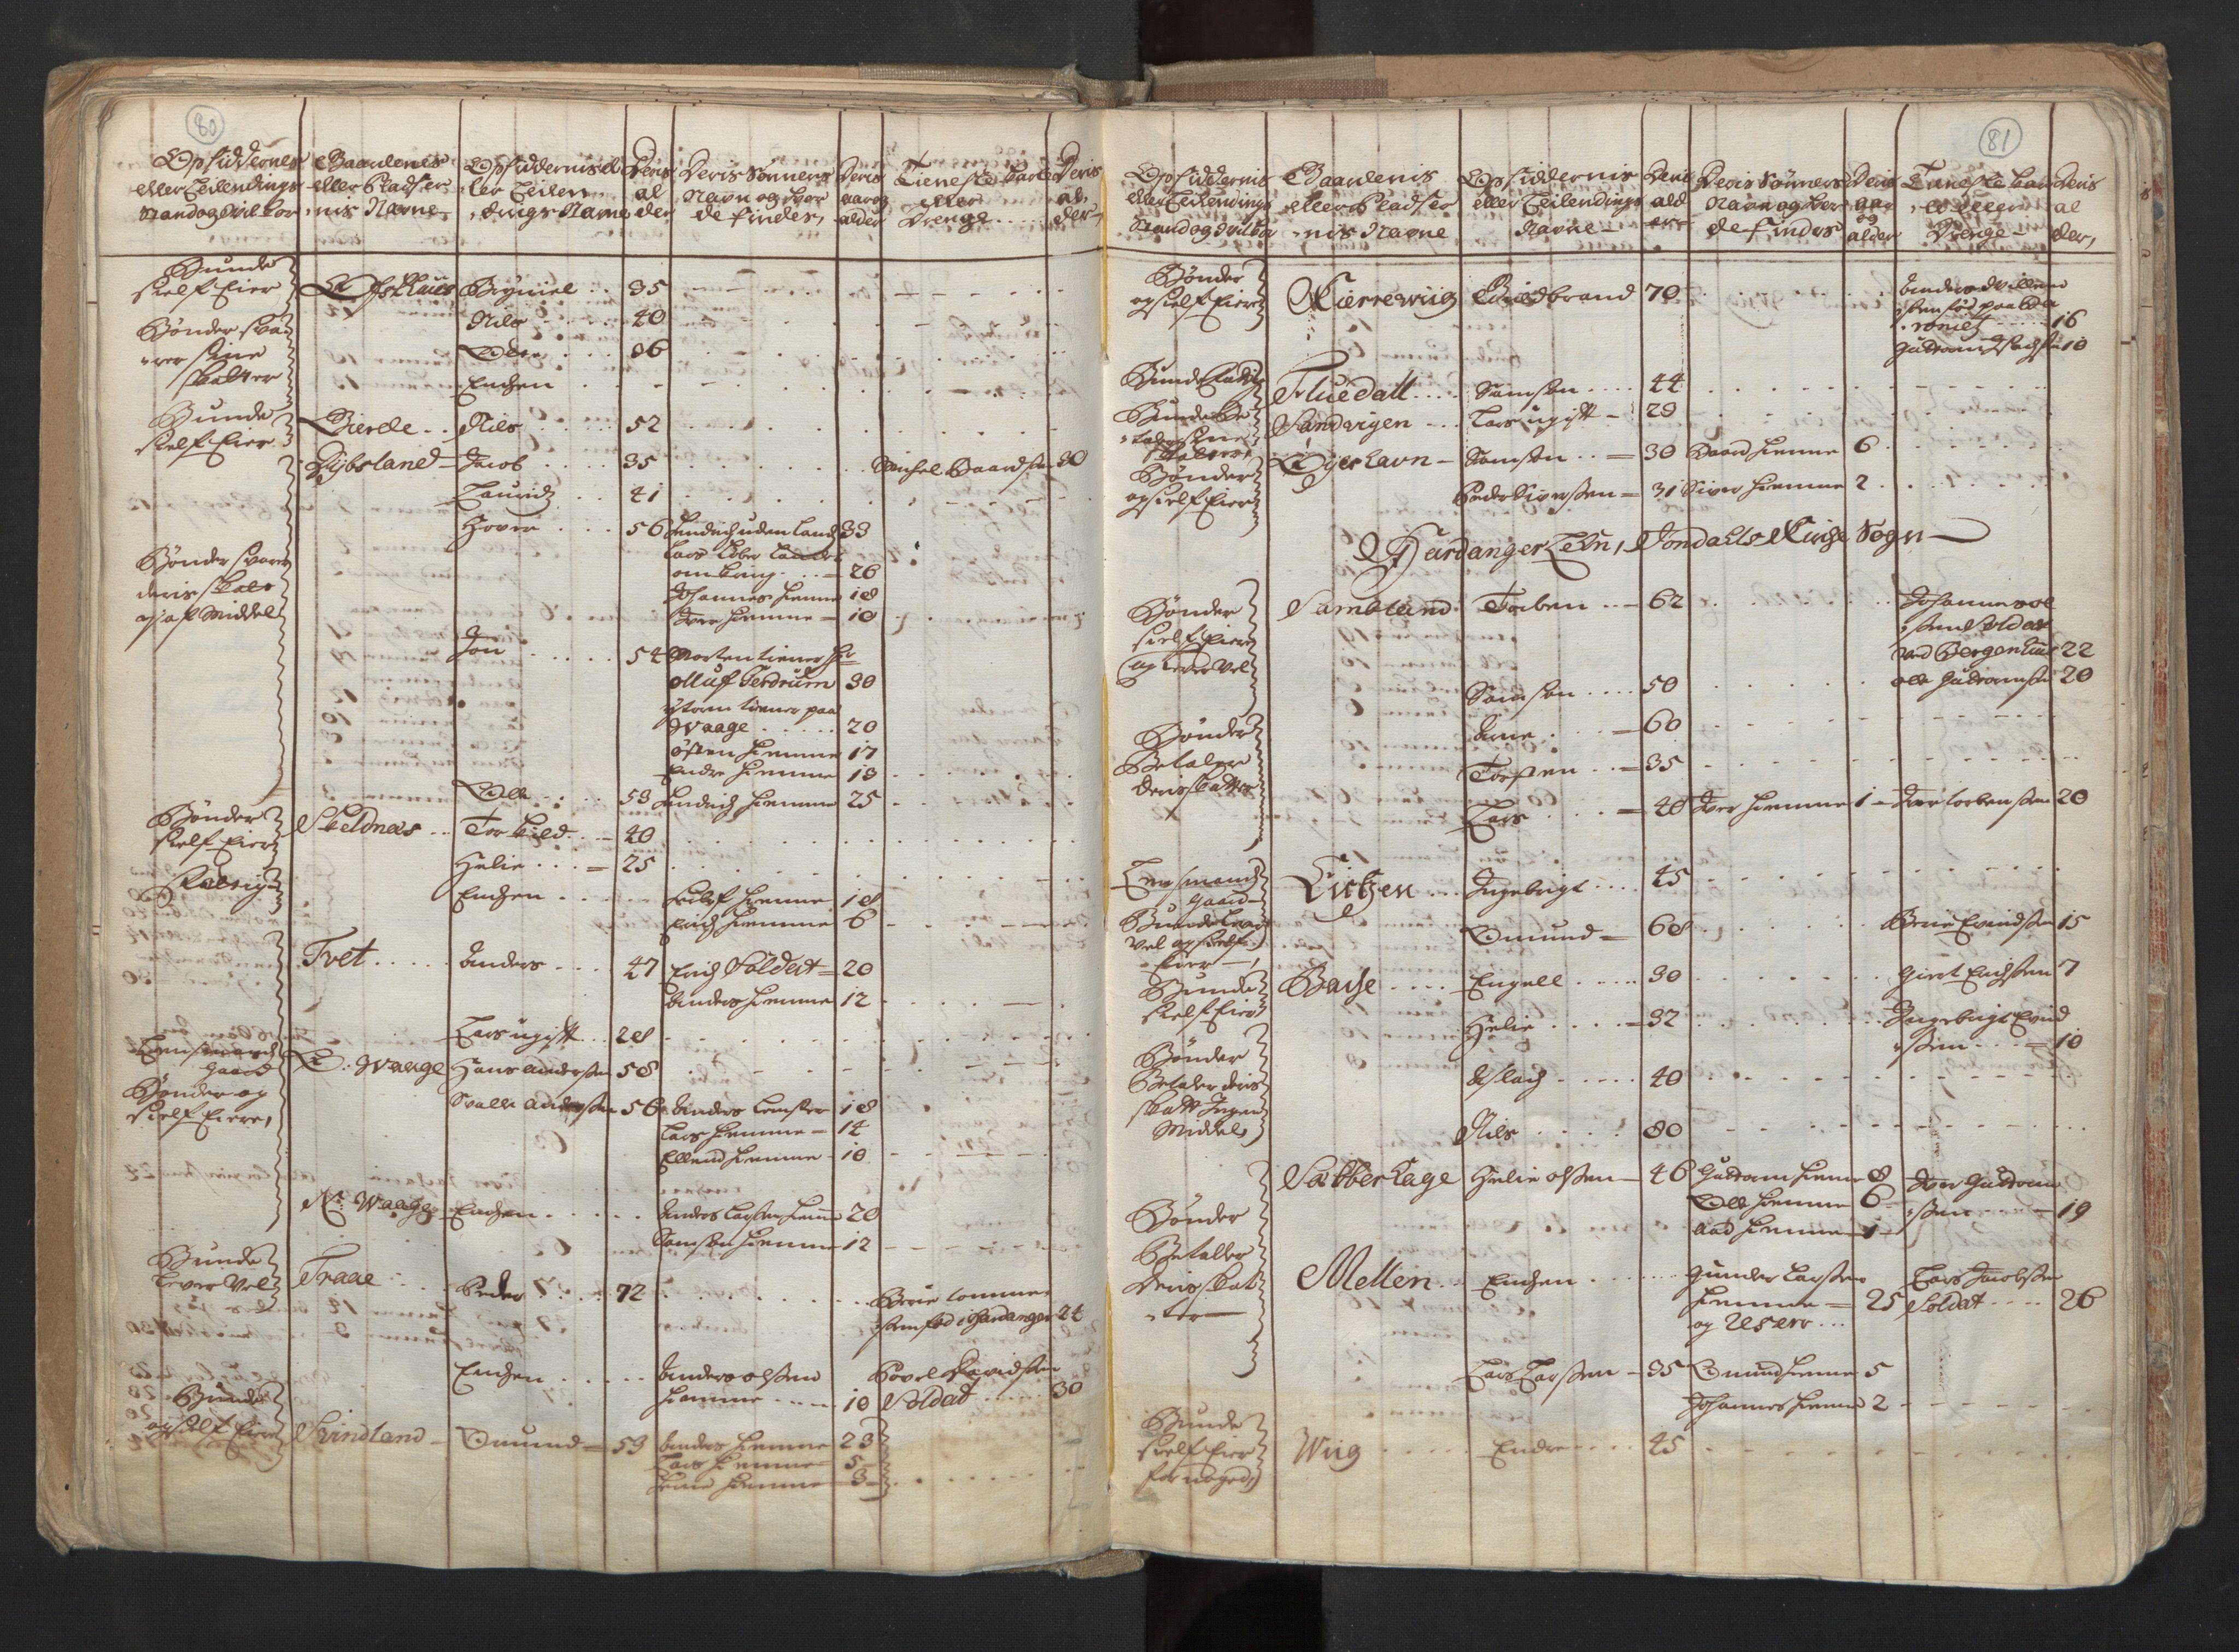 RA, Manntallet 1701, nr. 6: Sunnhordland fogderi og Hardanger fogderi, 1701, s. 80-81